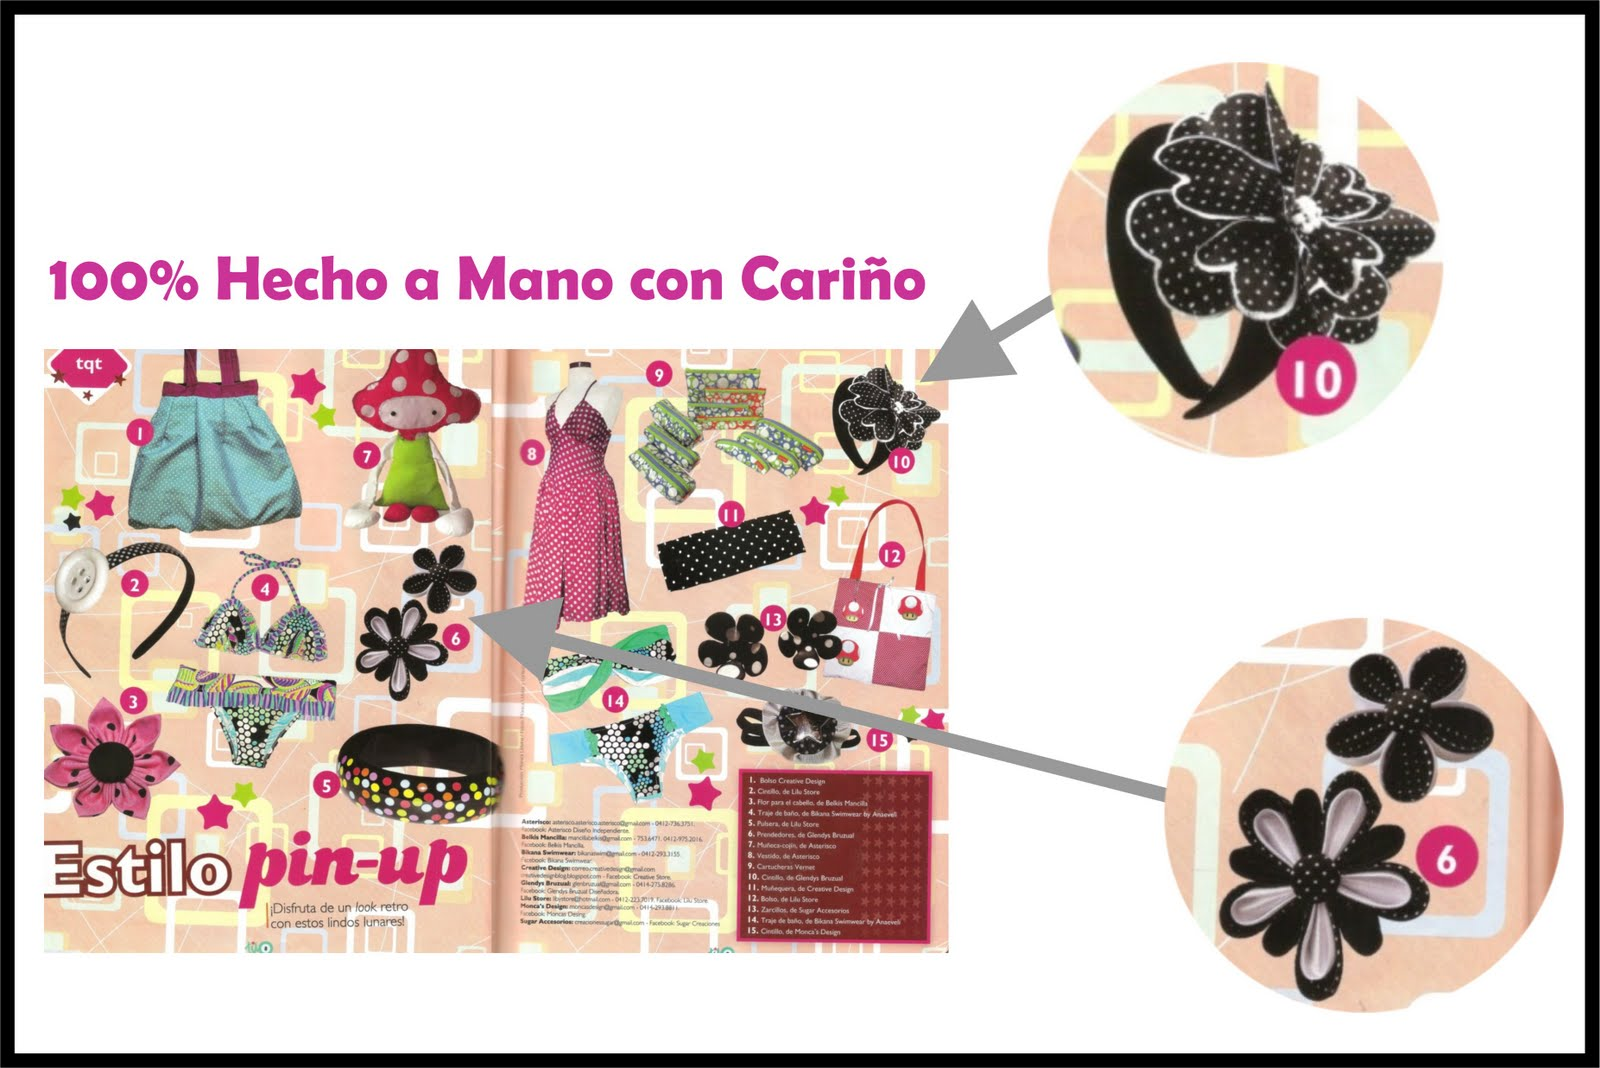 Jonas| Direction| News: One Direction en la revista Por bet at home Rückzug Kanada wie Casino auf bet at home zu spielen Ti, México